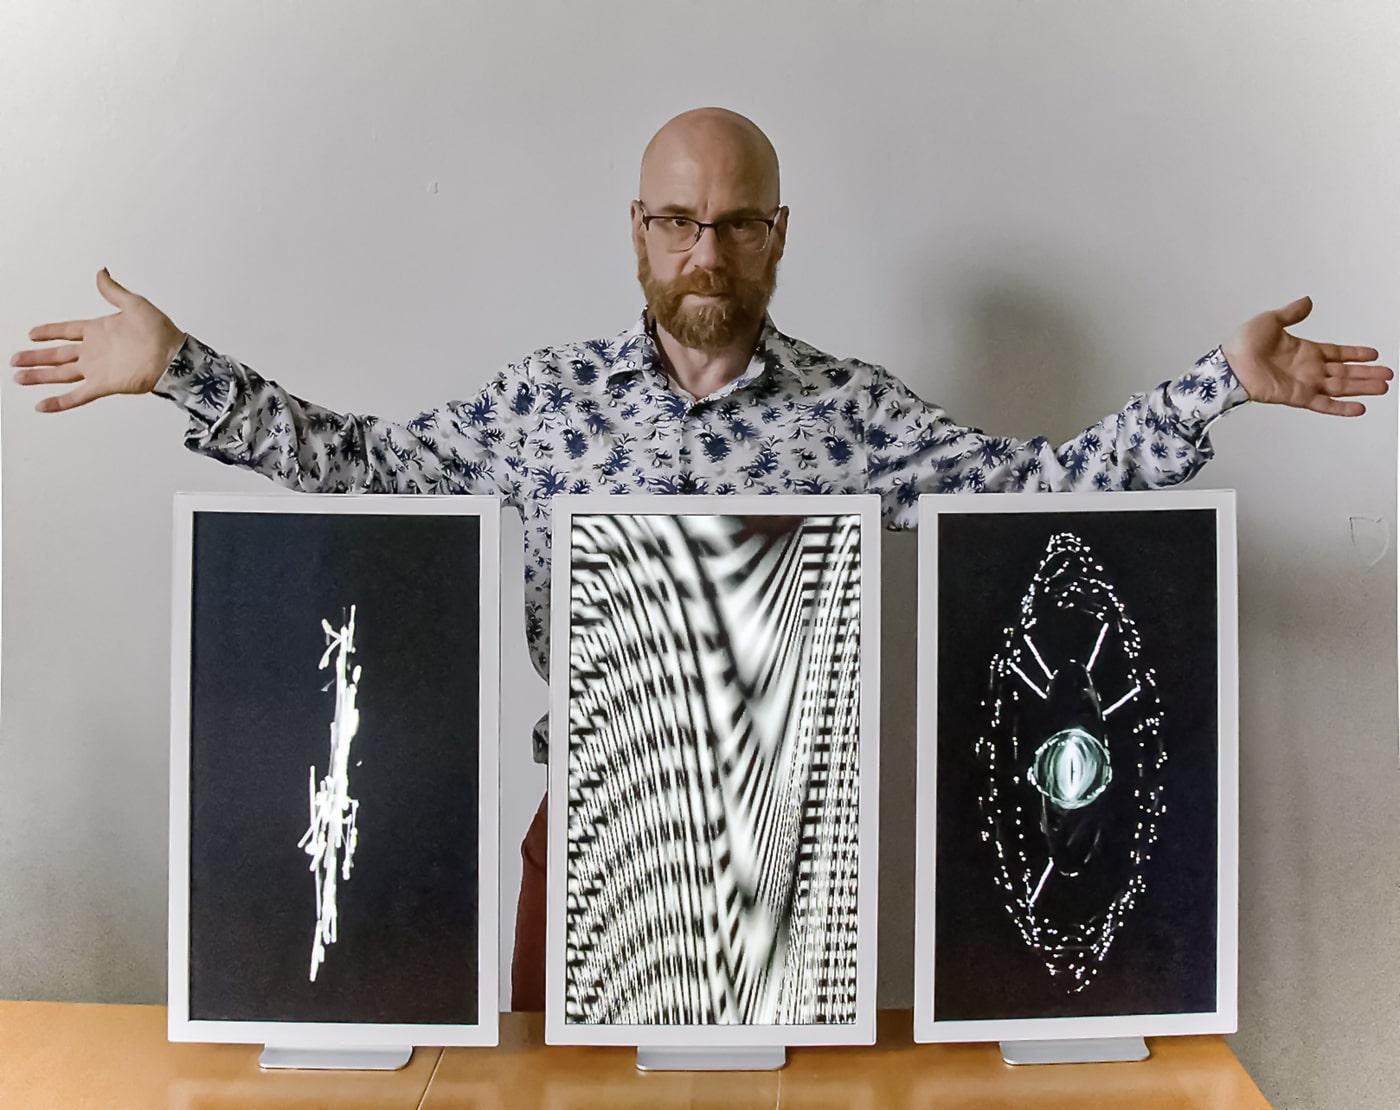 Benton C Bainbridge with 3 of his media artworks.